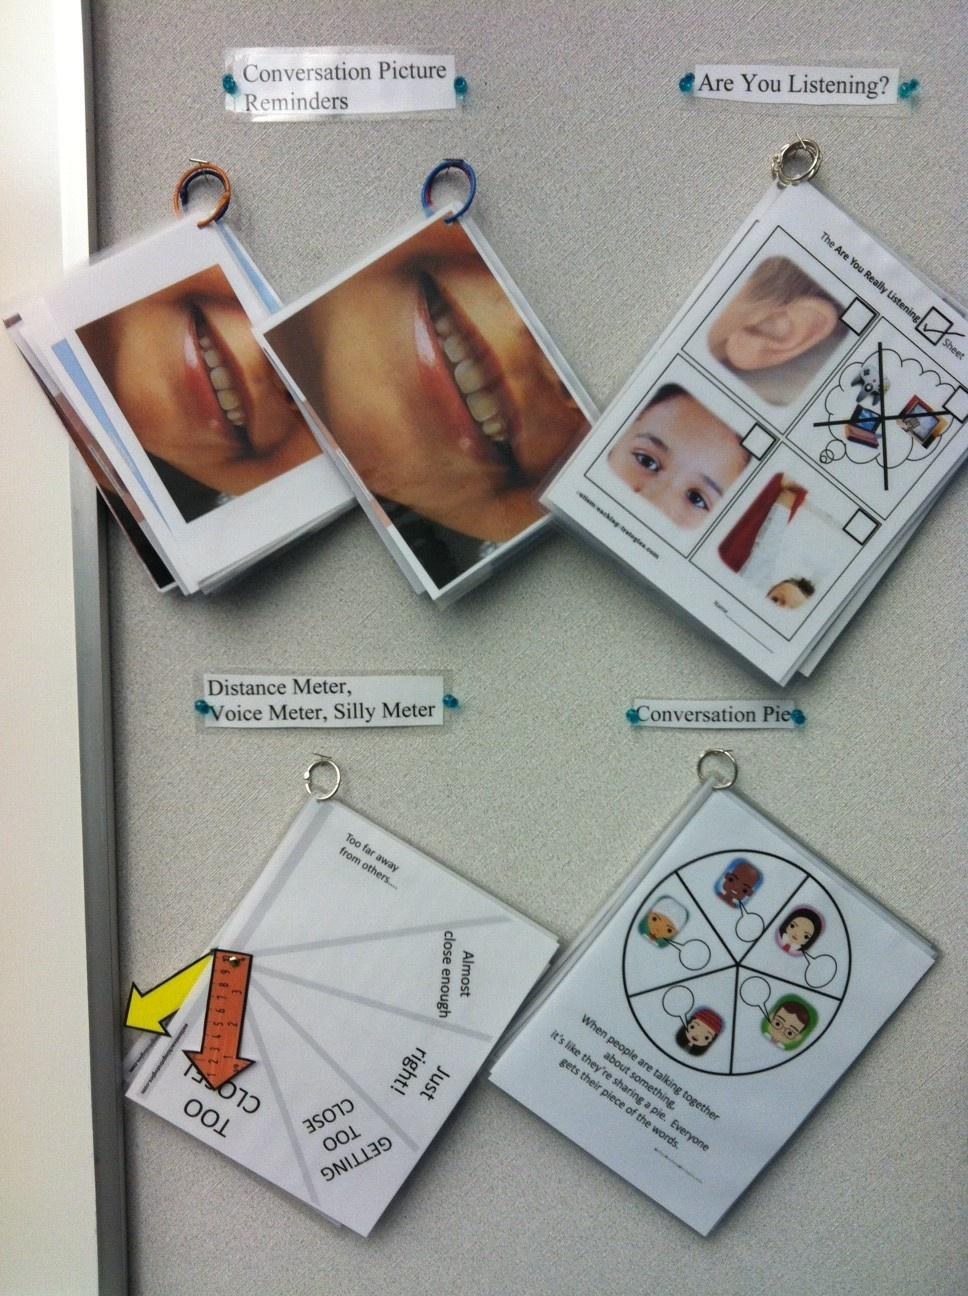 Free Social Skills Downloads | Autismteachingstrategies - Free Printable Social Skills Stories For Children